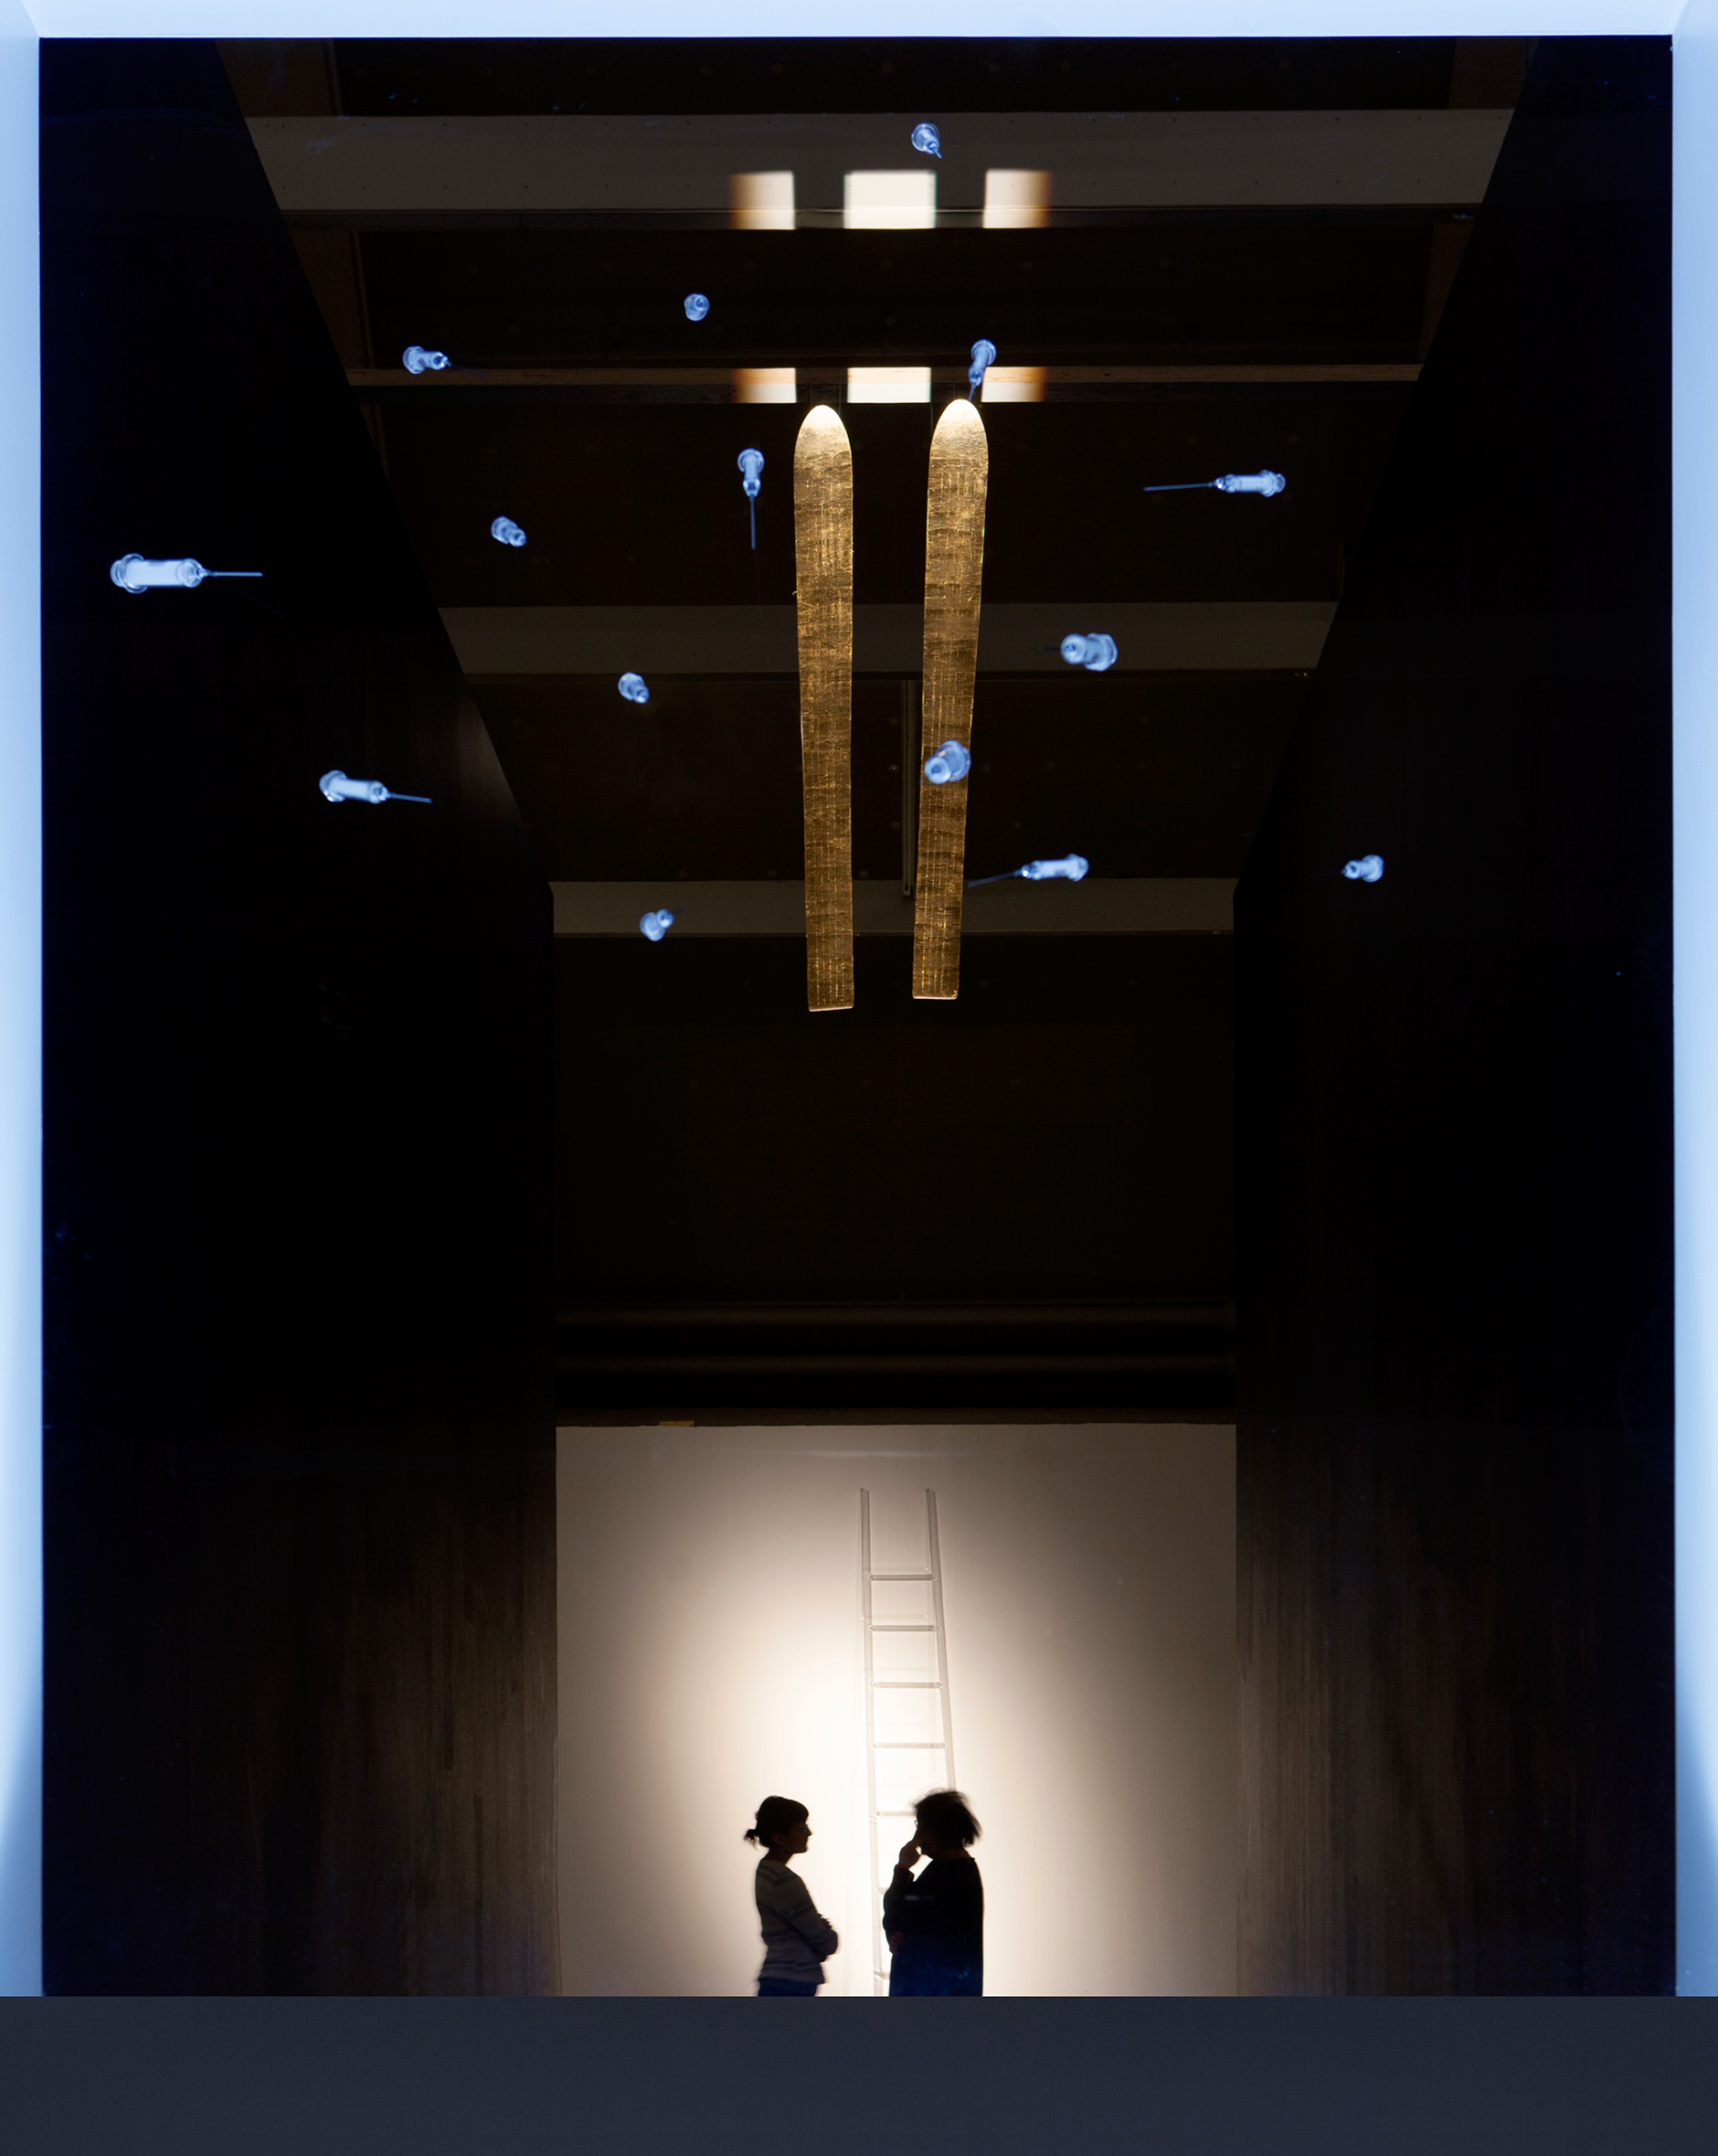 02-champion-the-critical-point-helsinki-art-museum